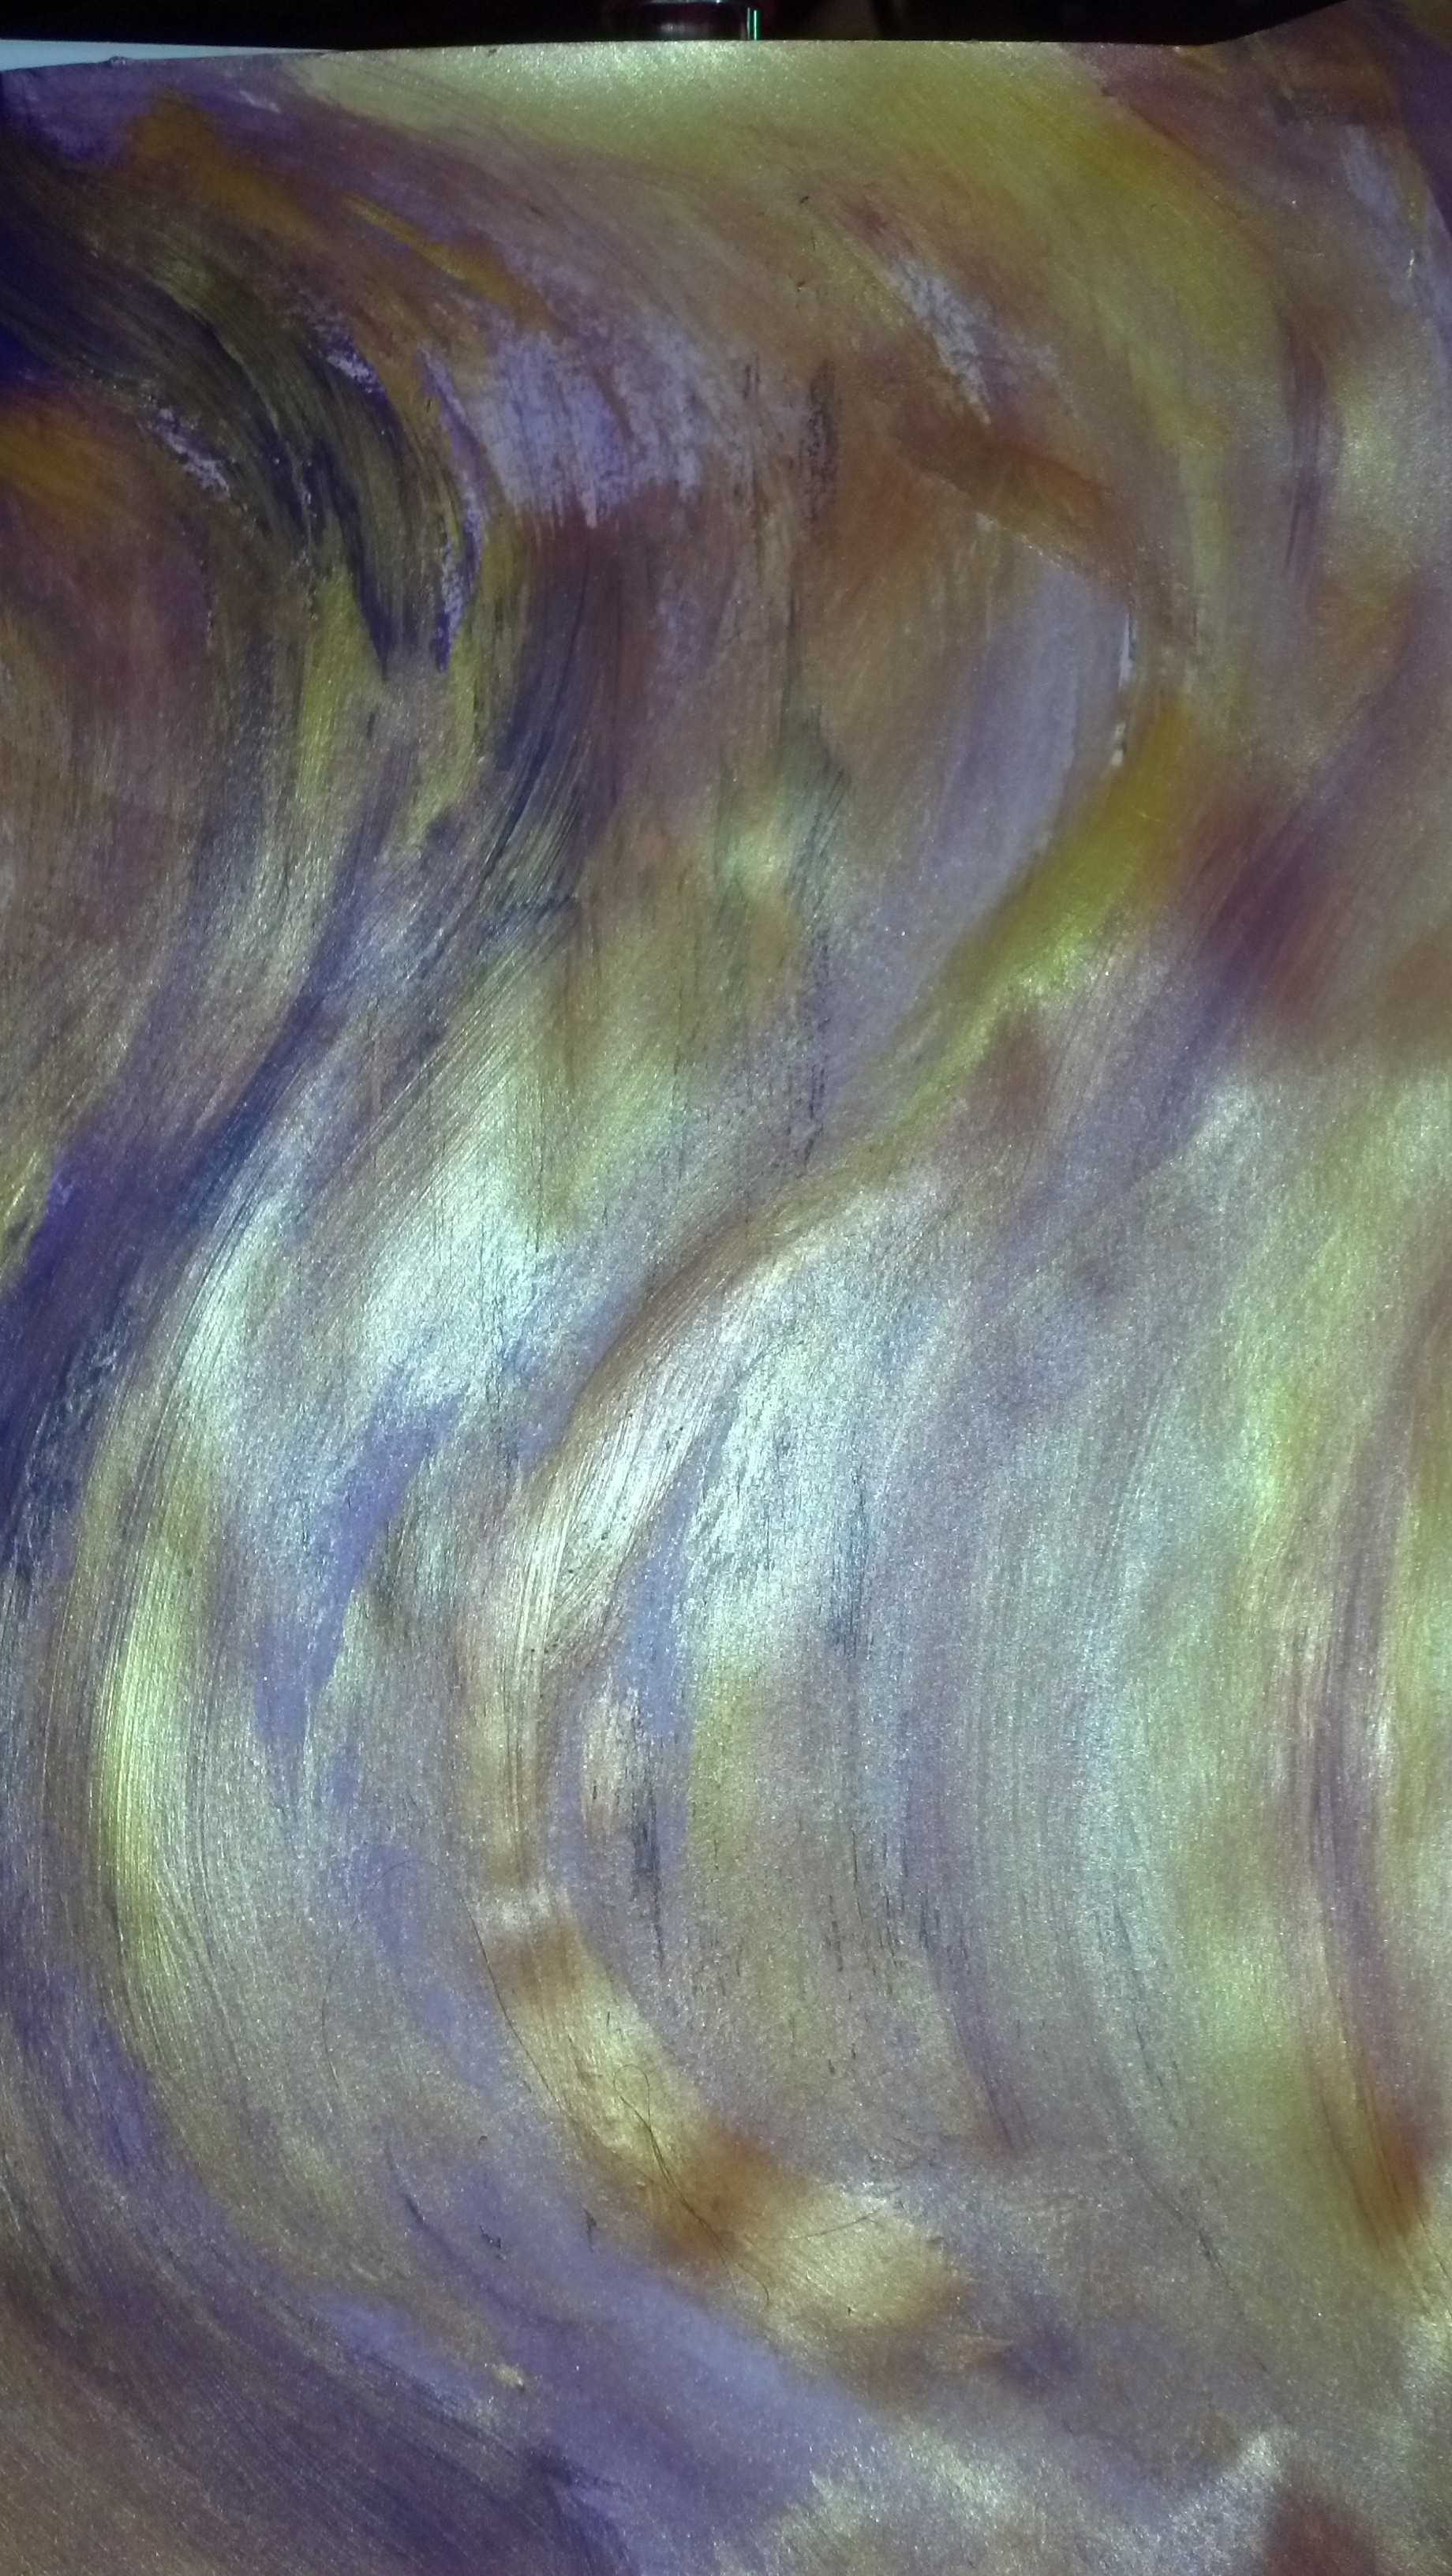 2012-12-16_03-06-46_819 (2)